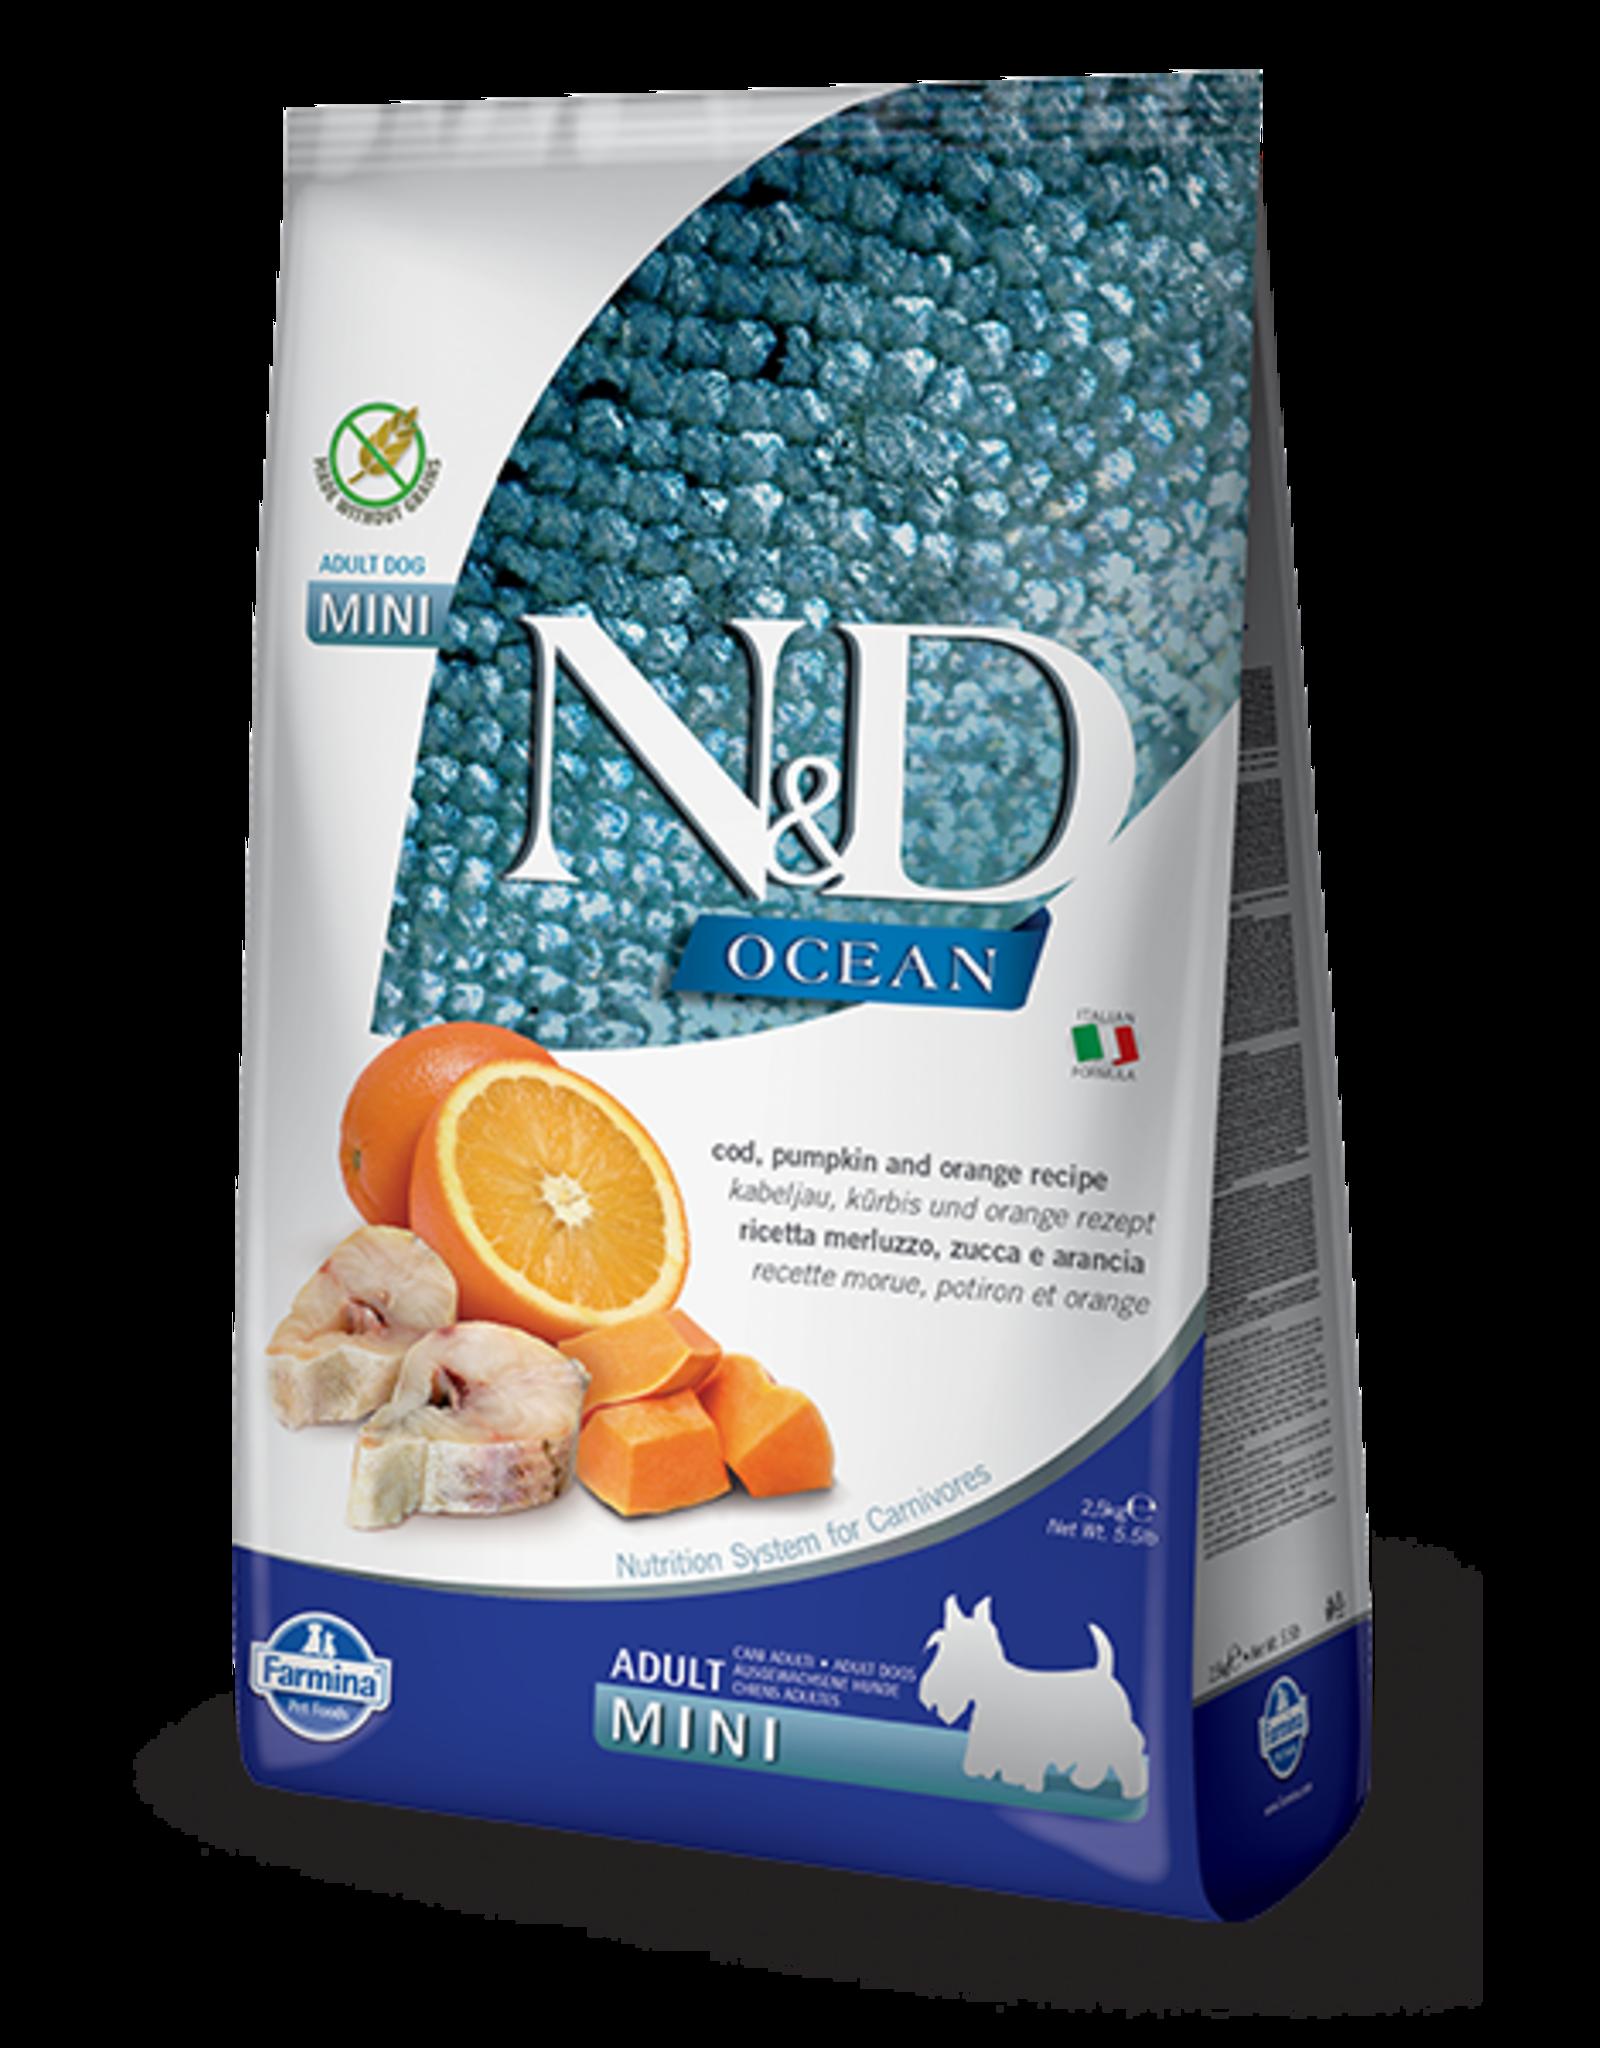 Farmina N&D Farmina N&D Ocean Cod, Pumpkin & Orange Adult Mini Dog Food 5.5lb